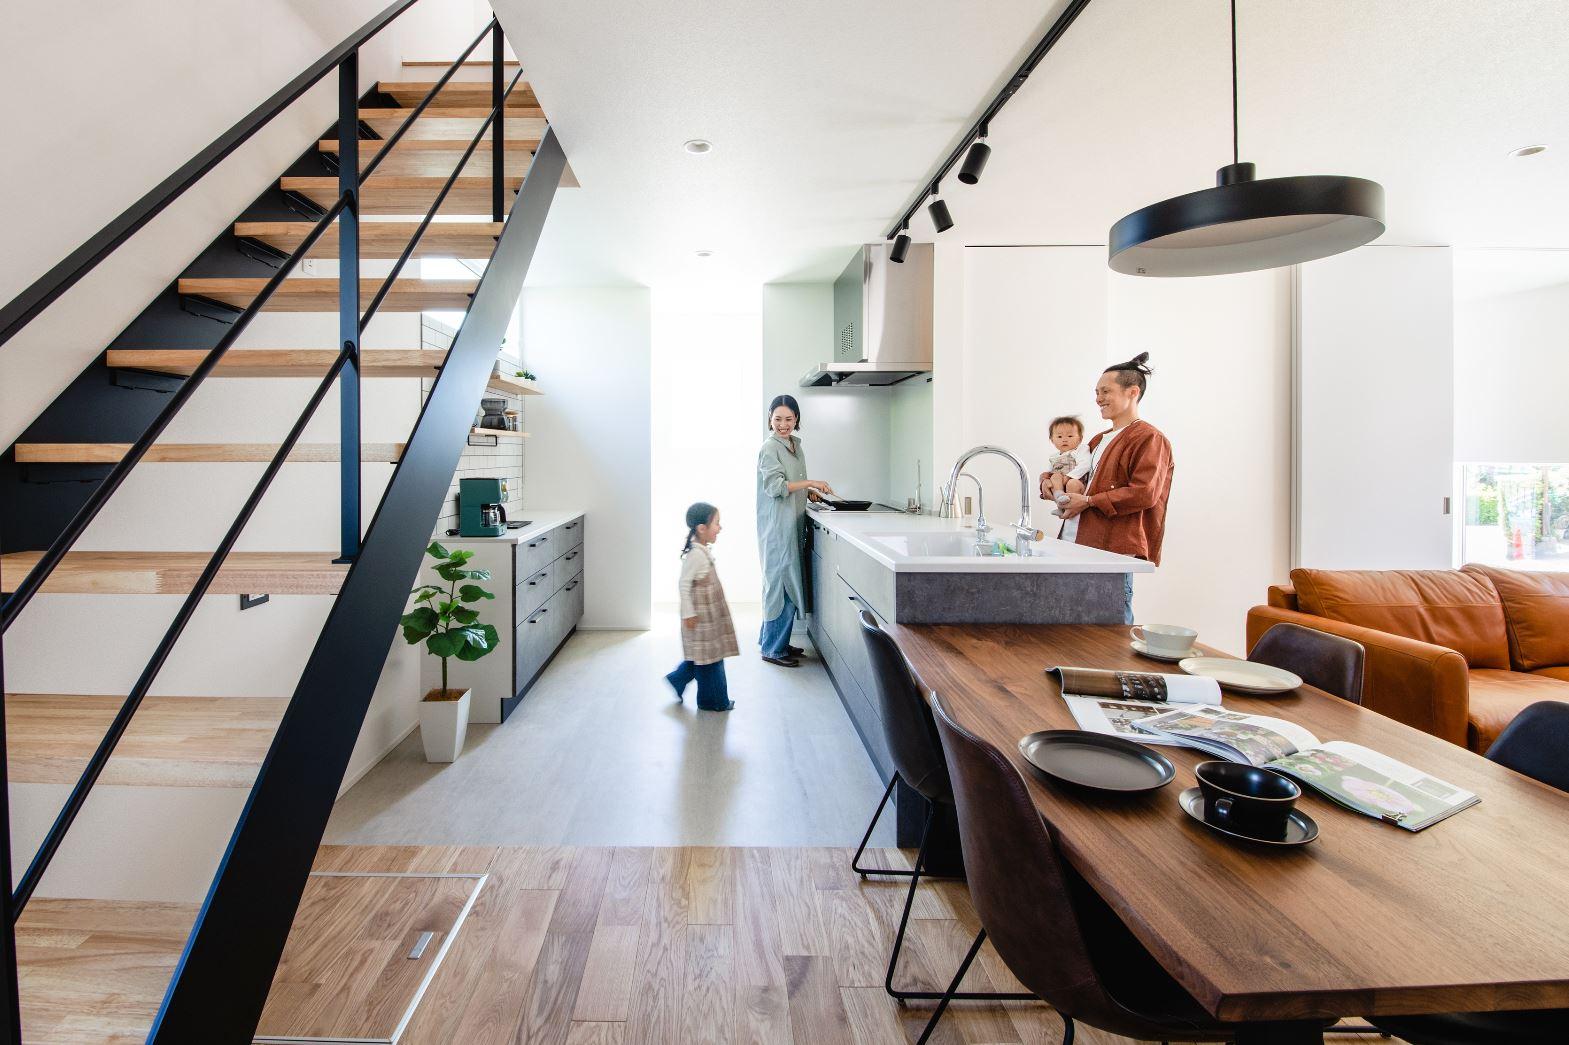 S.CONNECT(エスコネクト)【デザイン住宅、収納力、間取り】リビング階段で空間を有効活用。スケルトンにすることで視線が奥へと抜けていく